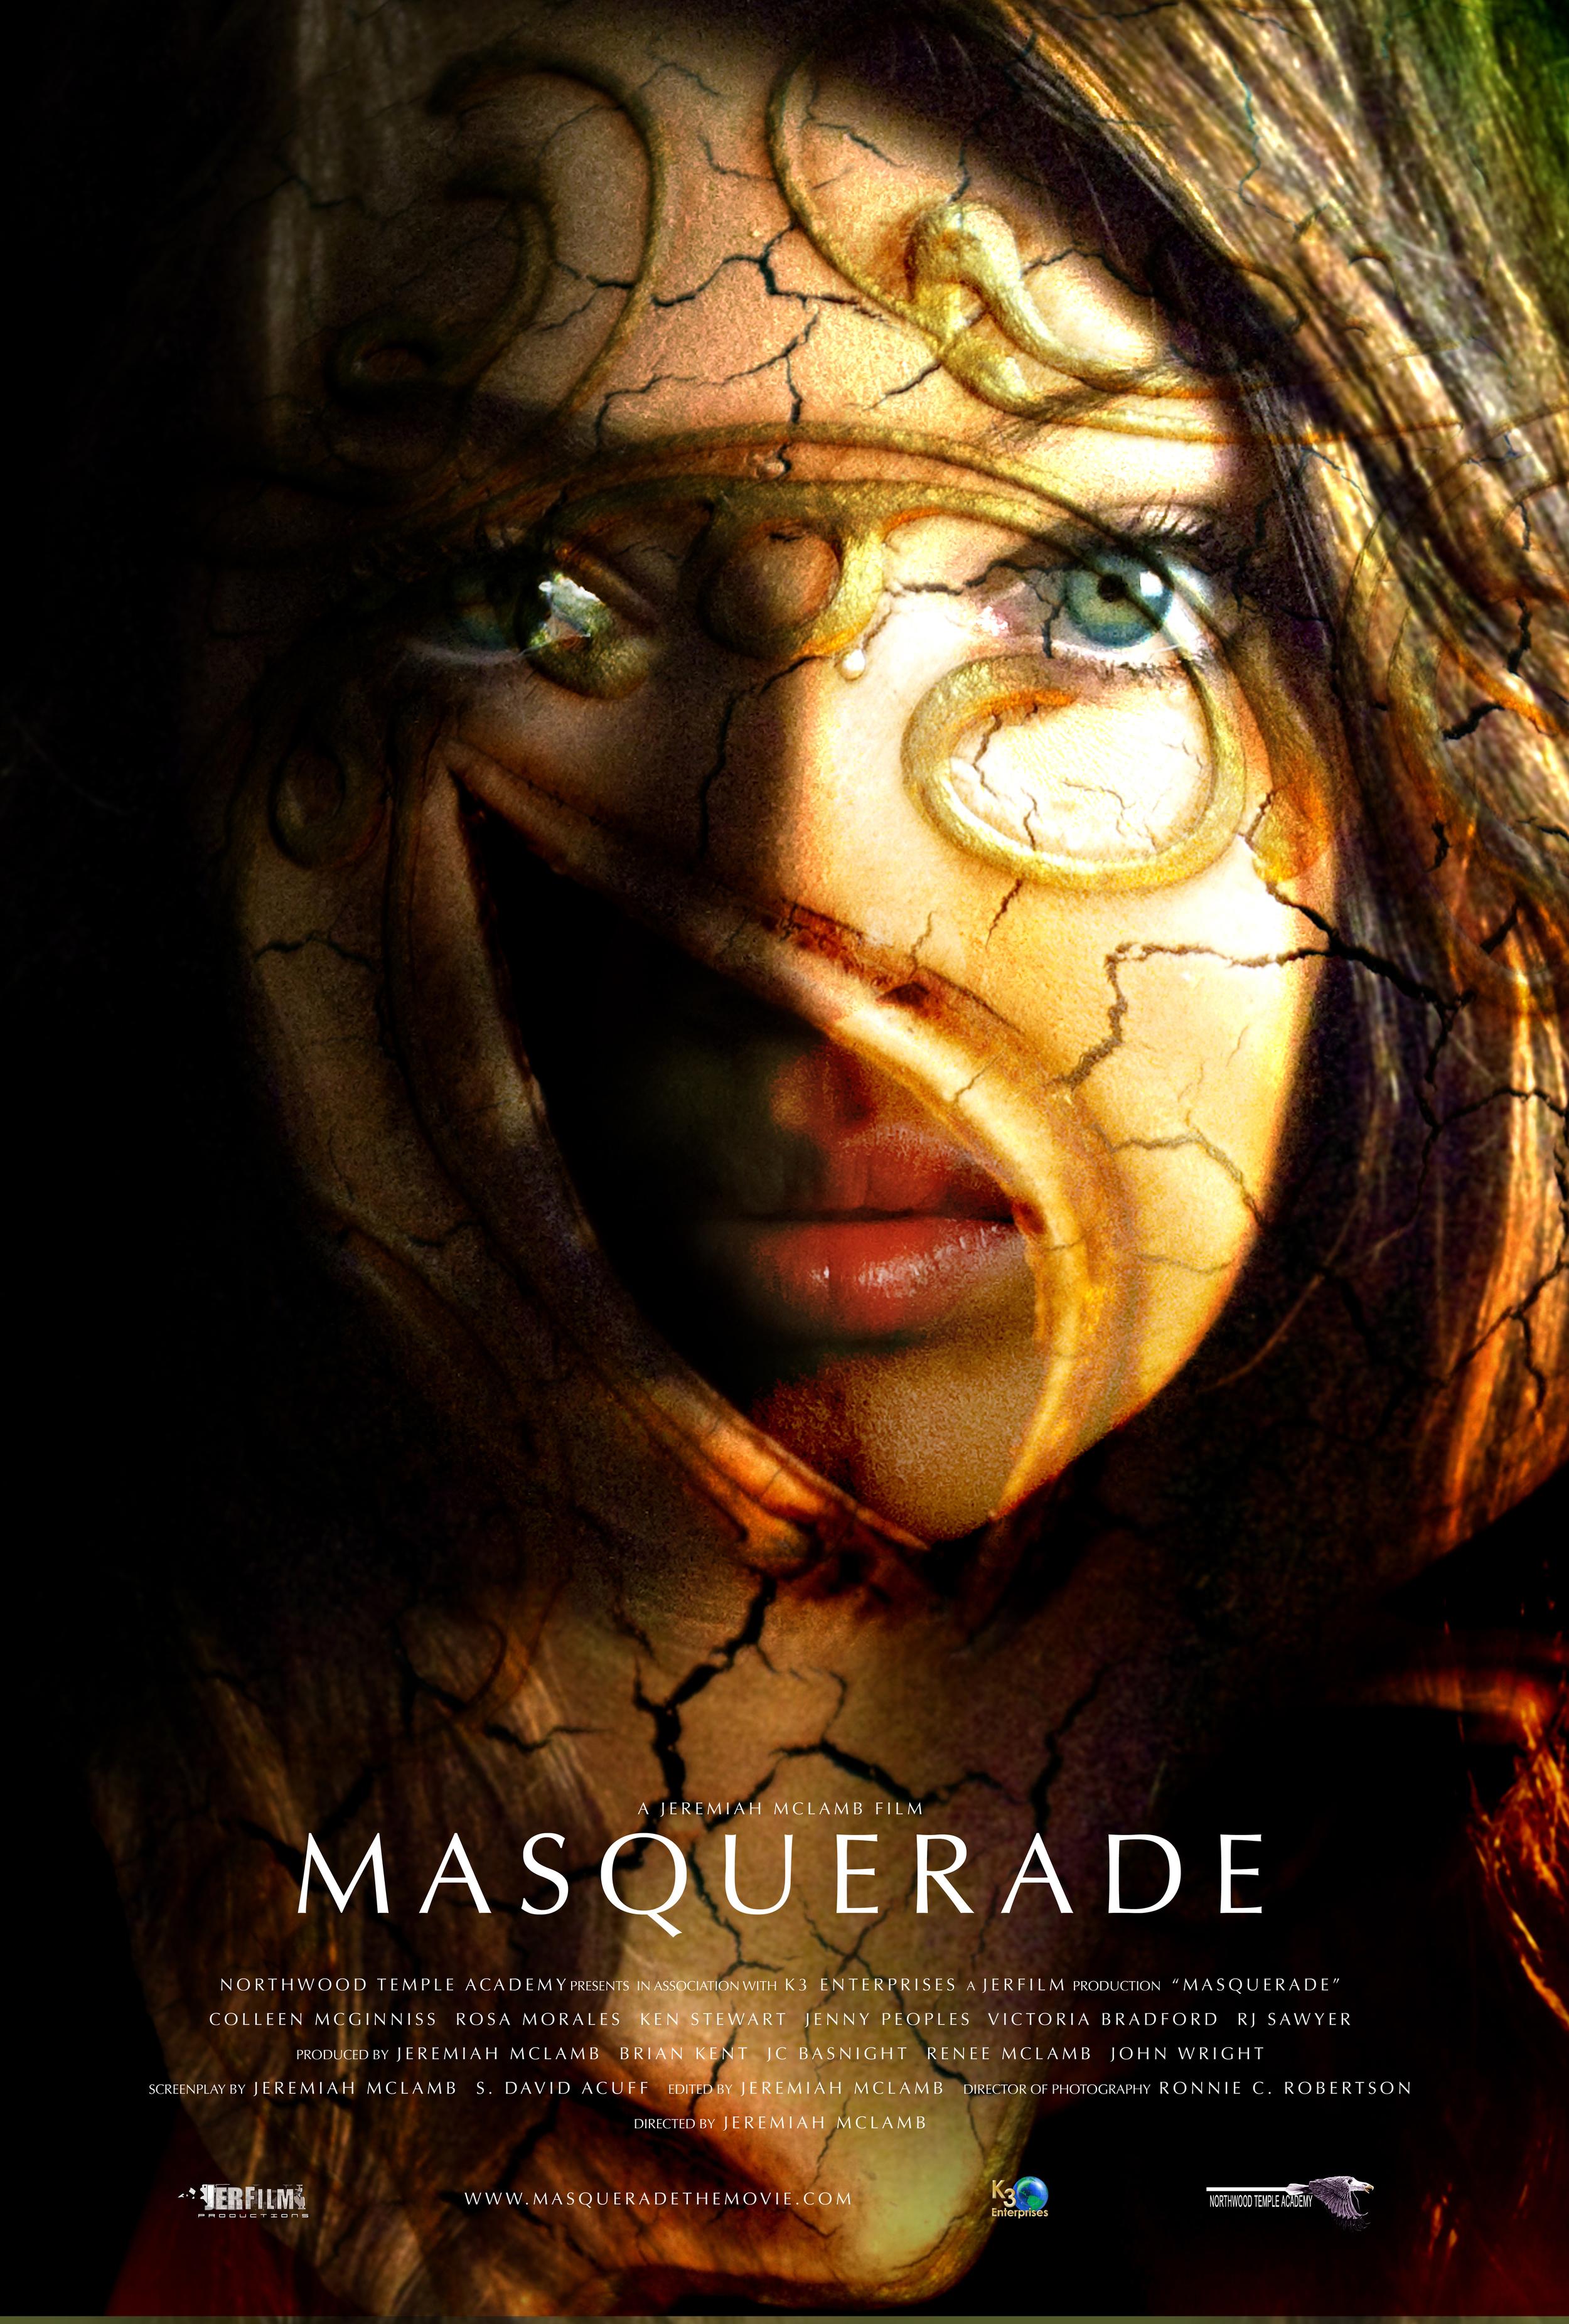 Masquerade Poster 04 Xsmall.jpg